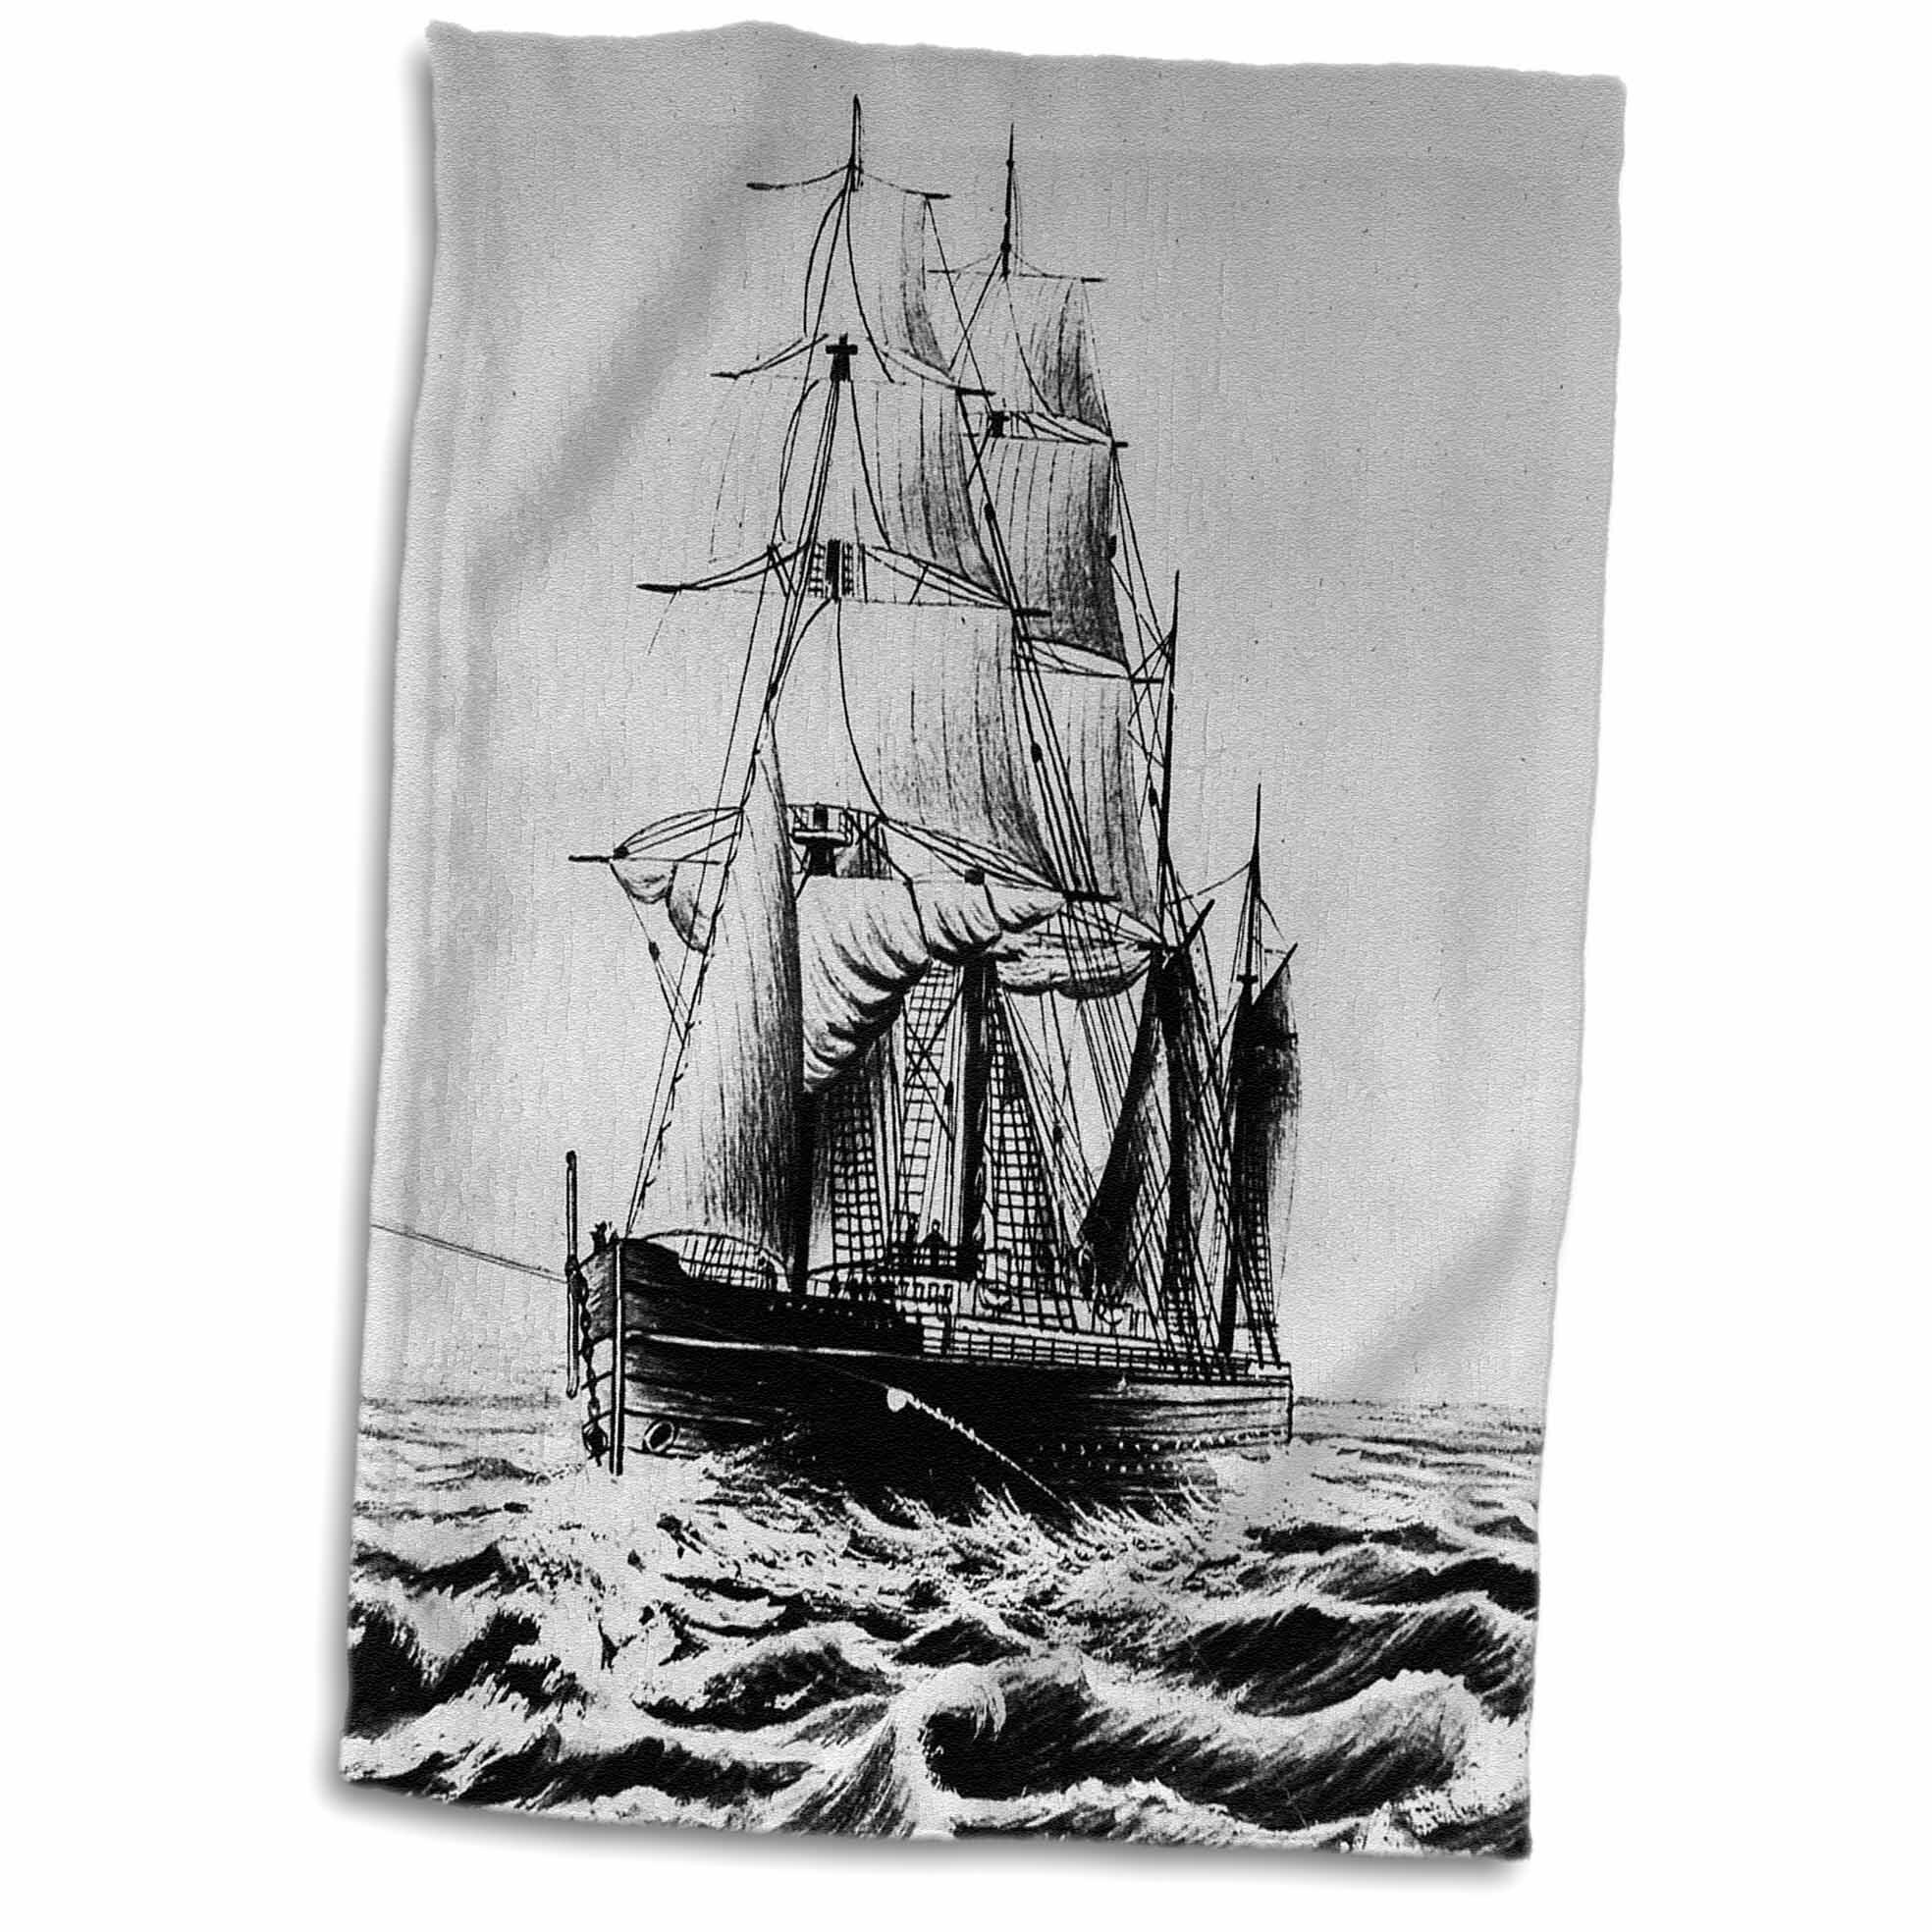 East Urban Home Peters Victorian Anchored Magic Lantern Maritime Tall Sailing Ship Hand Towel Wayfair